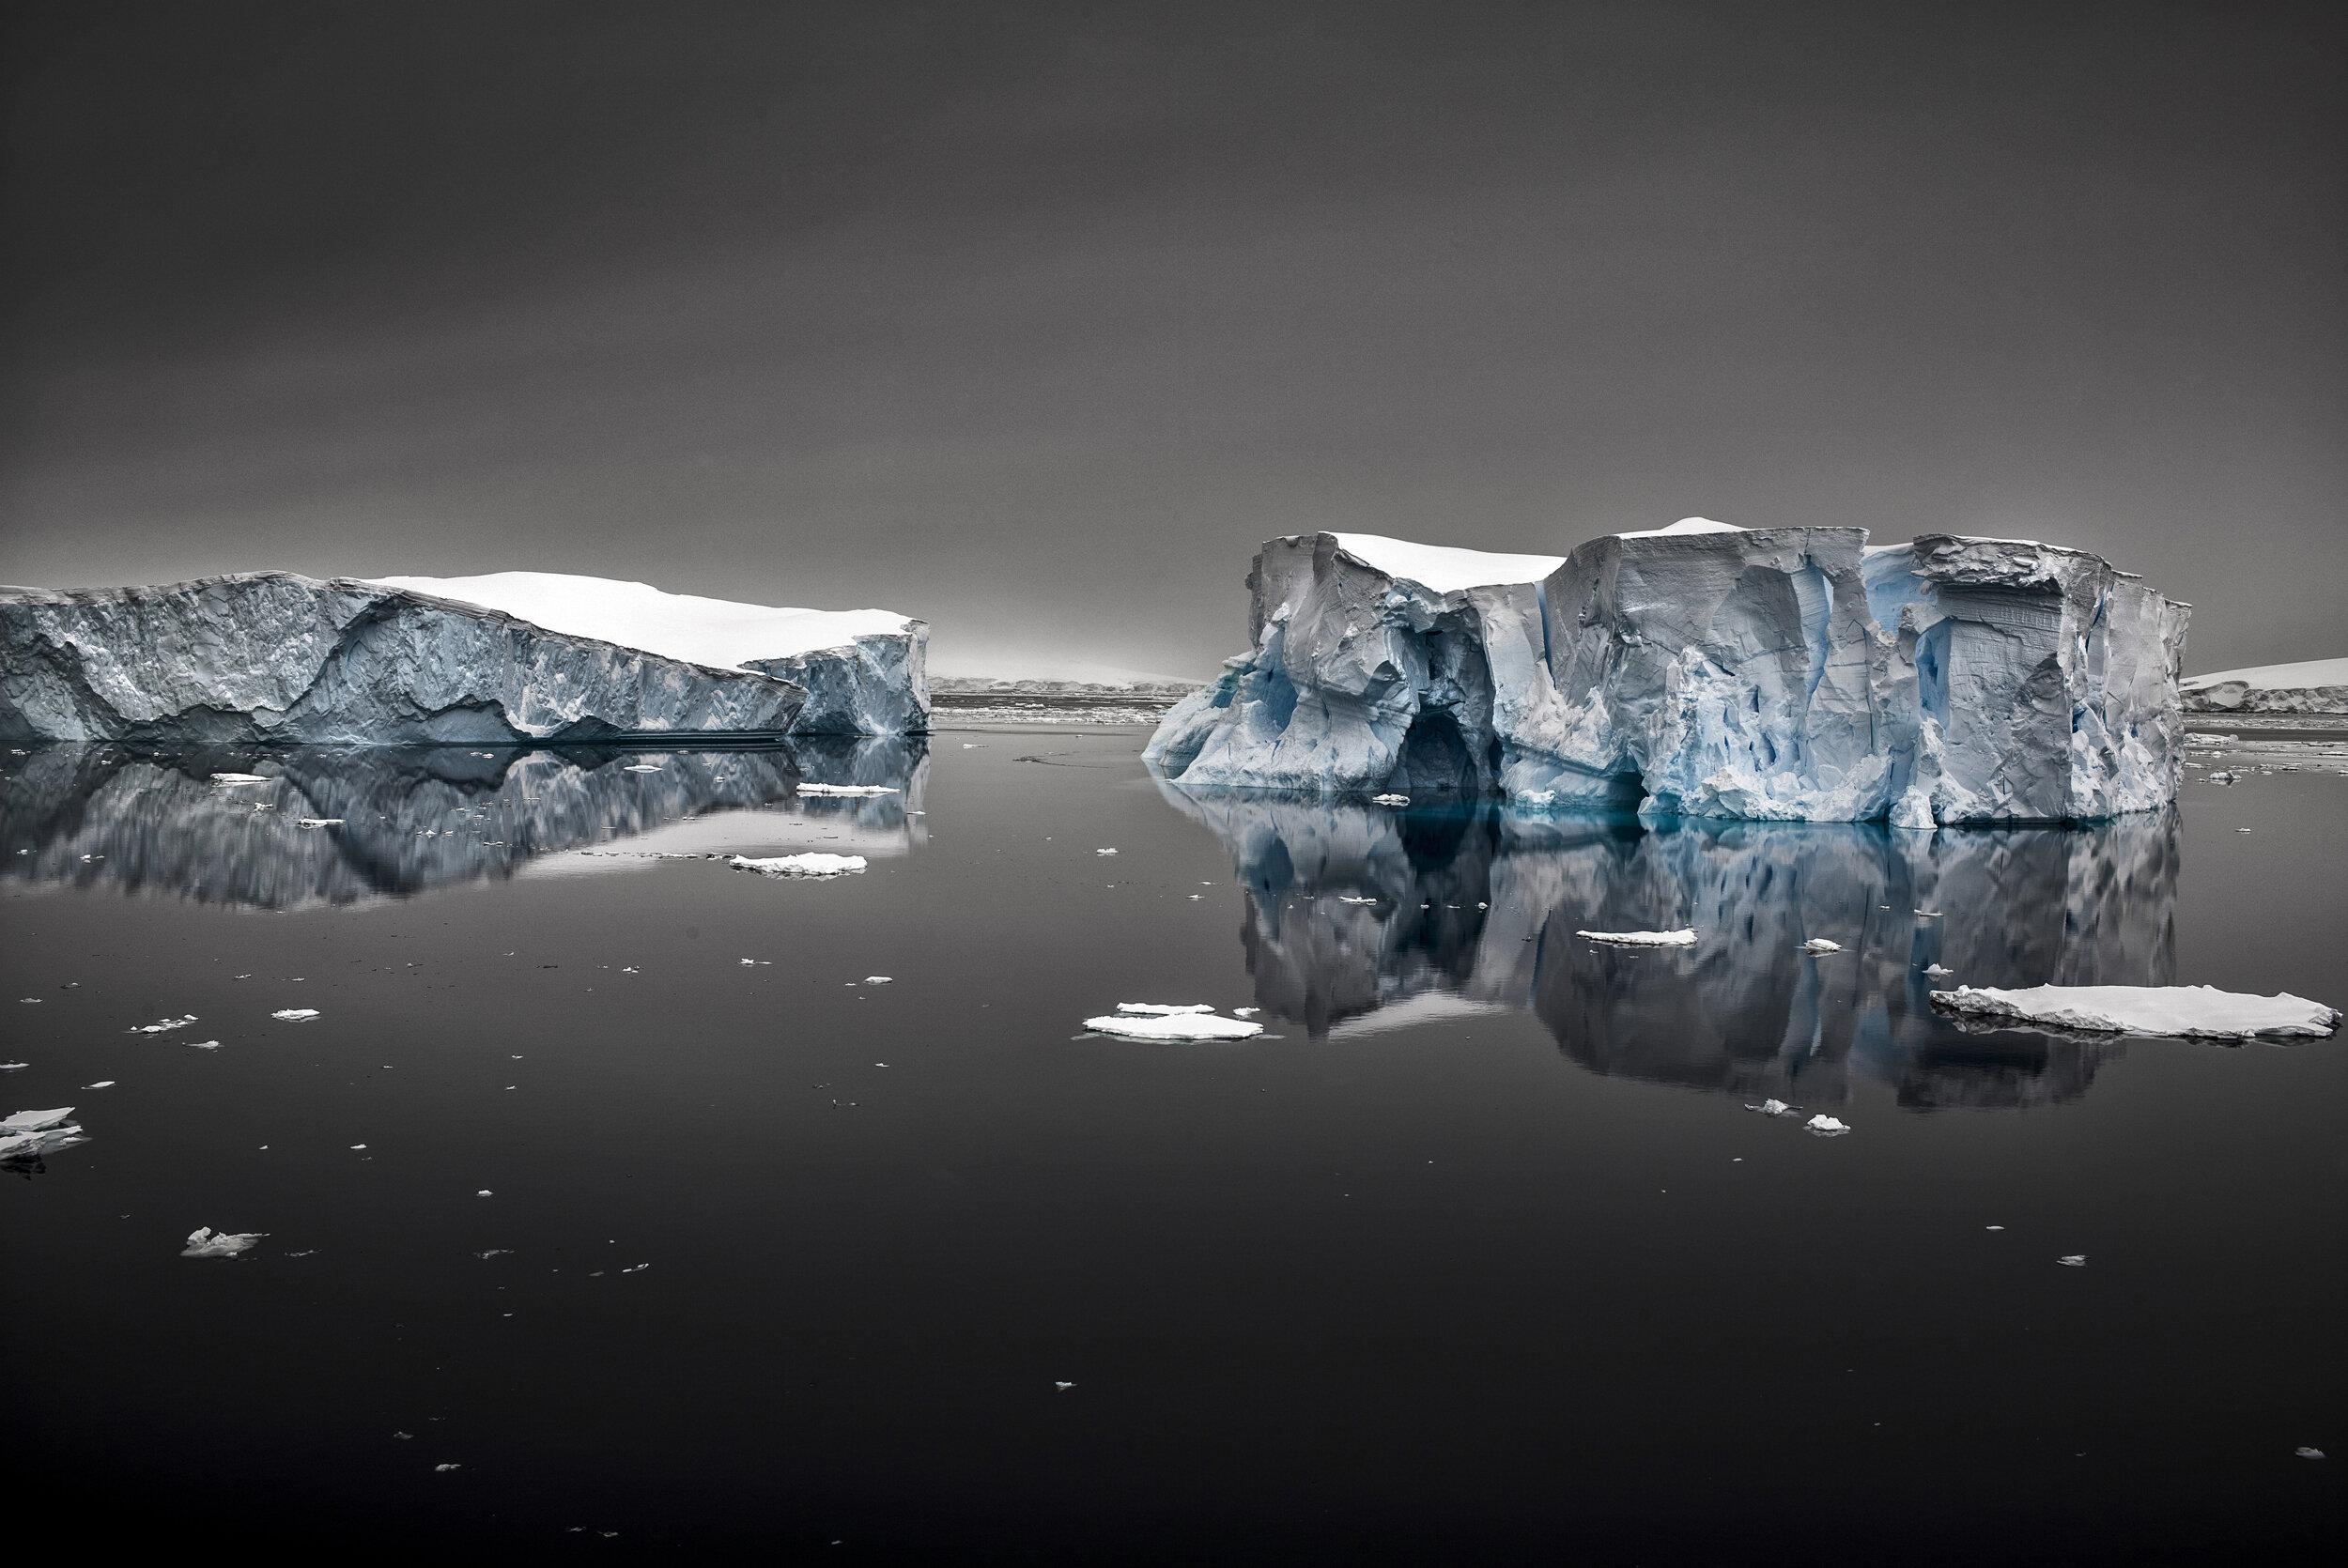 manuel_uebler_antarctica_twilight_001.jpg